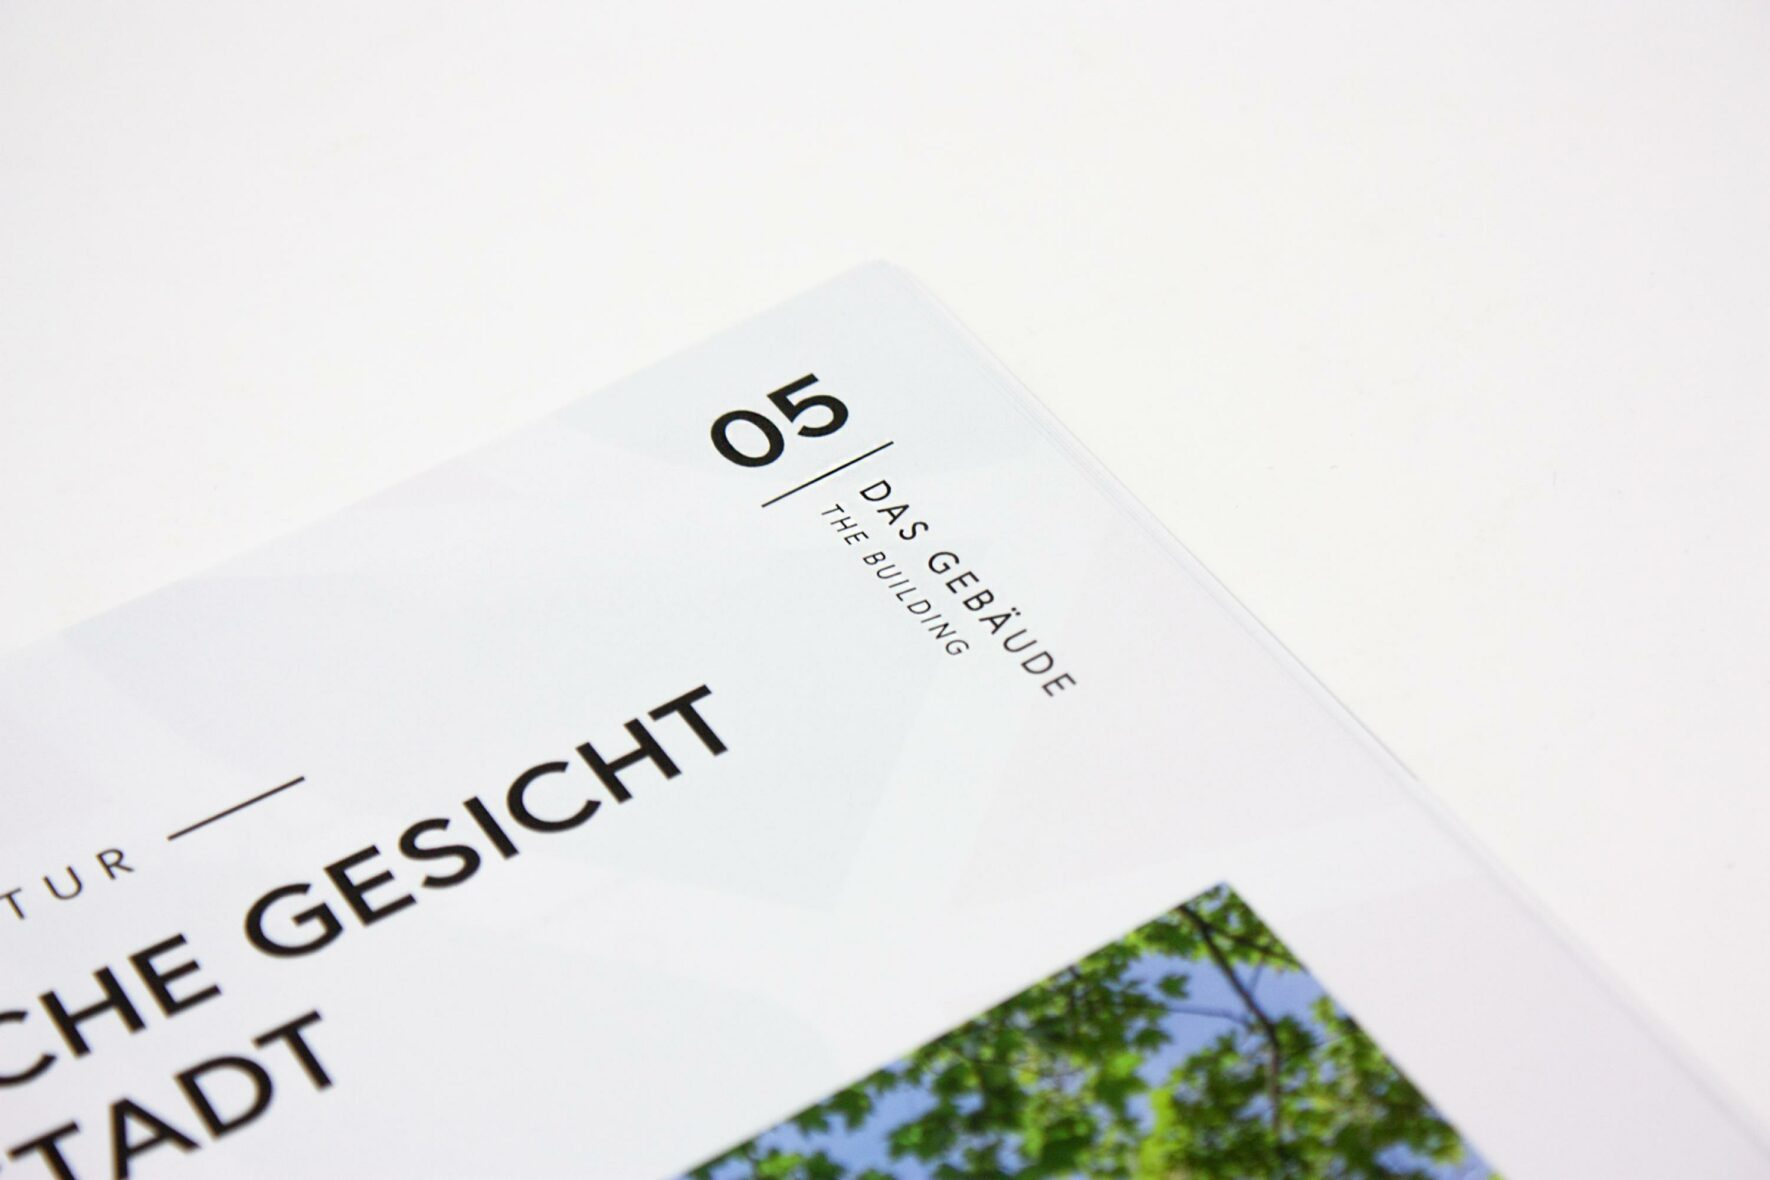 Broschuere-Osloer-Immobilienbranding-Trendcity-FORMLOS-berlin-90